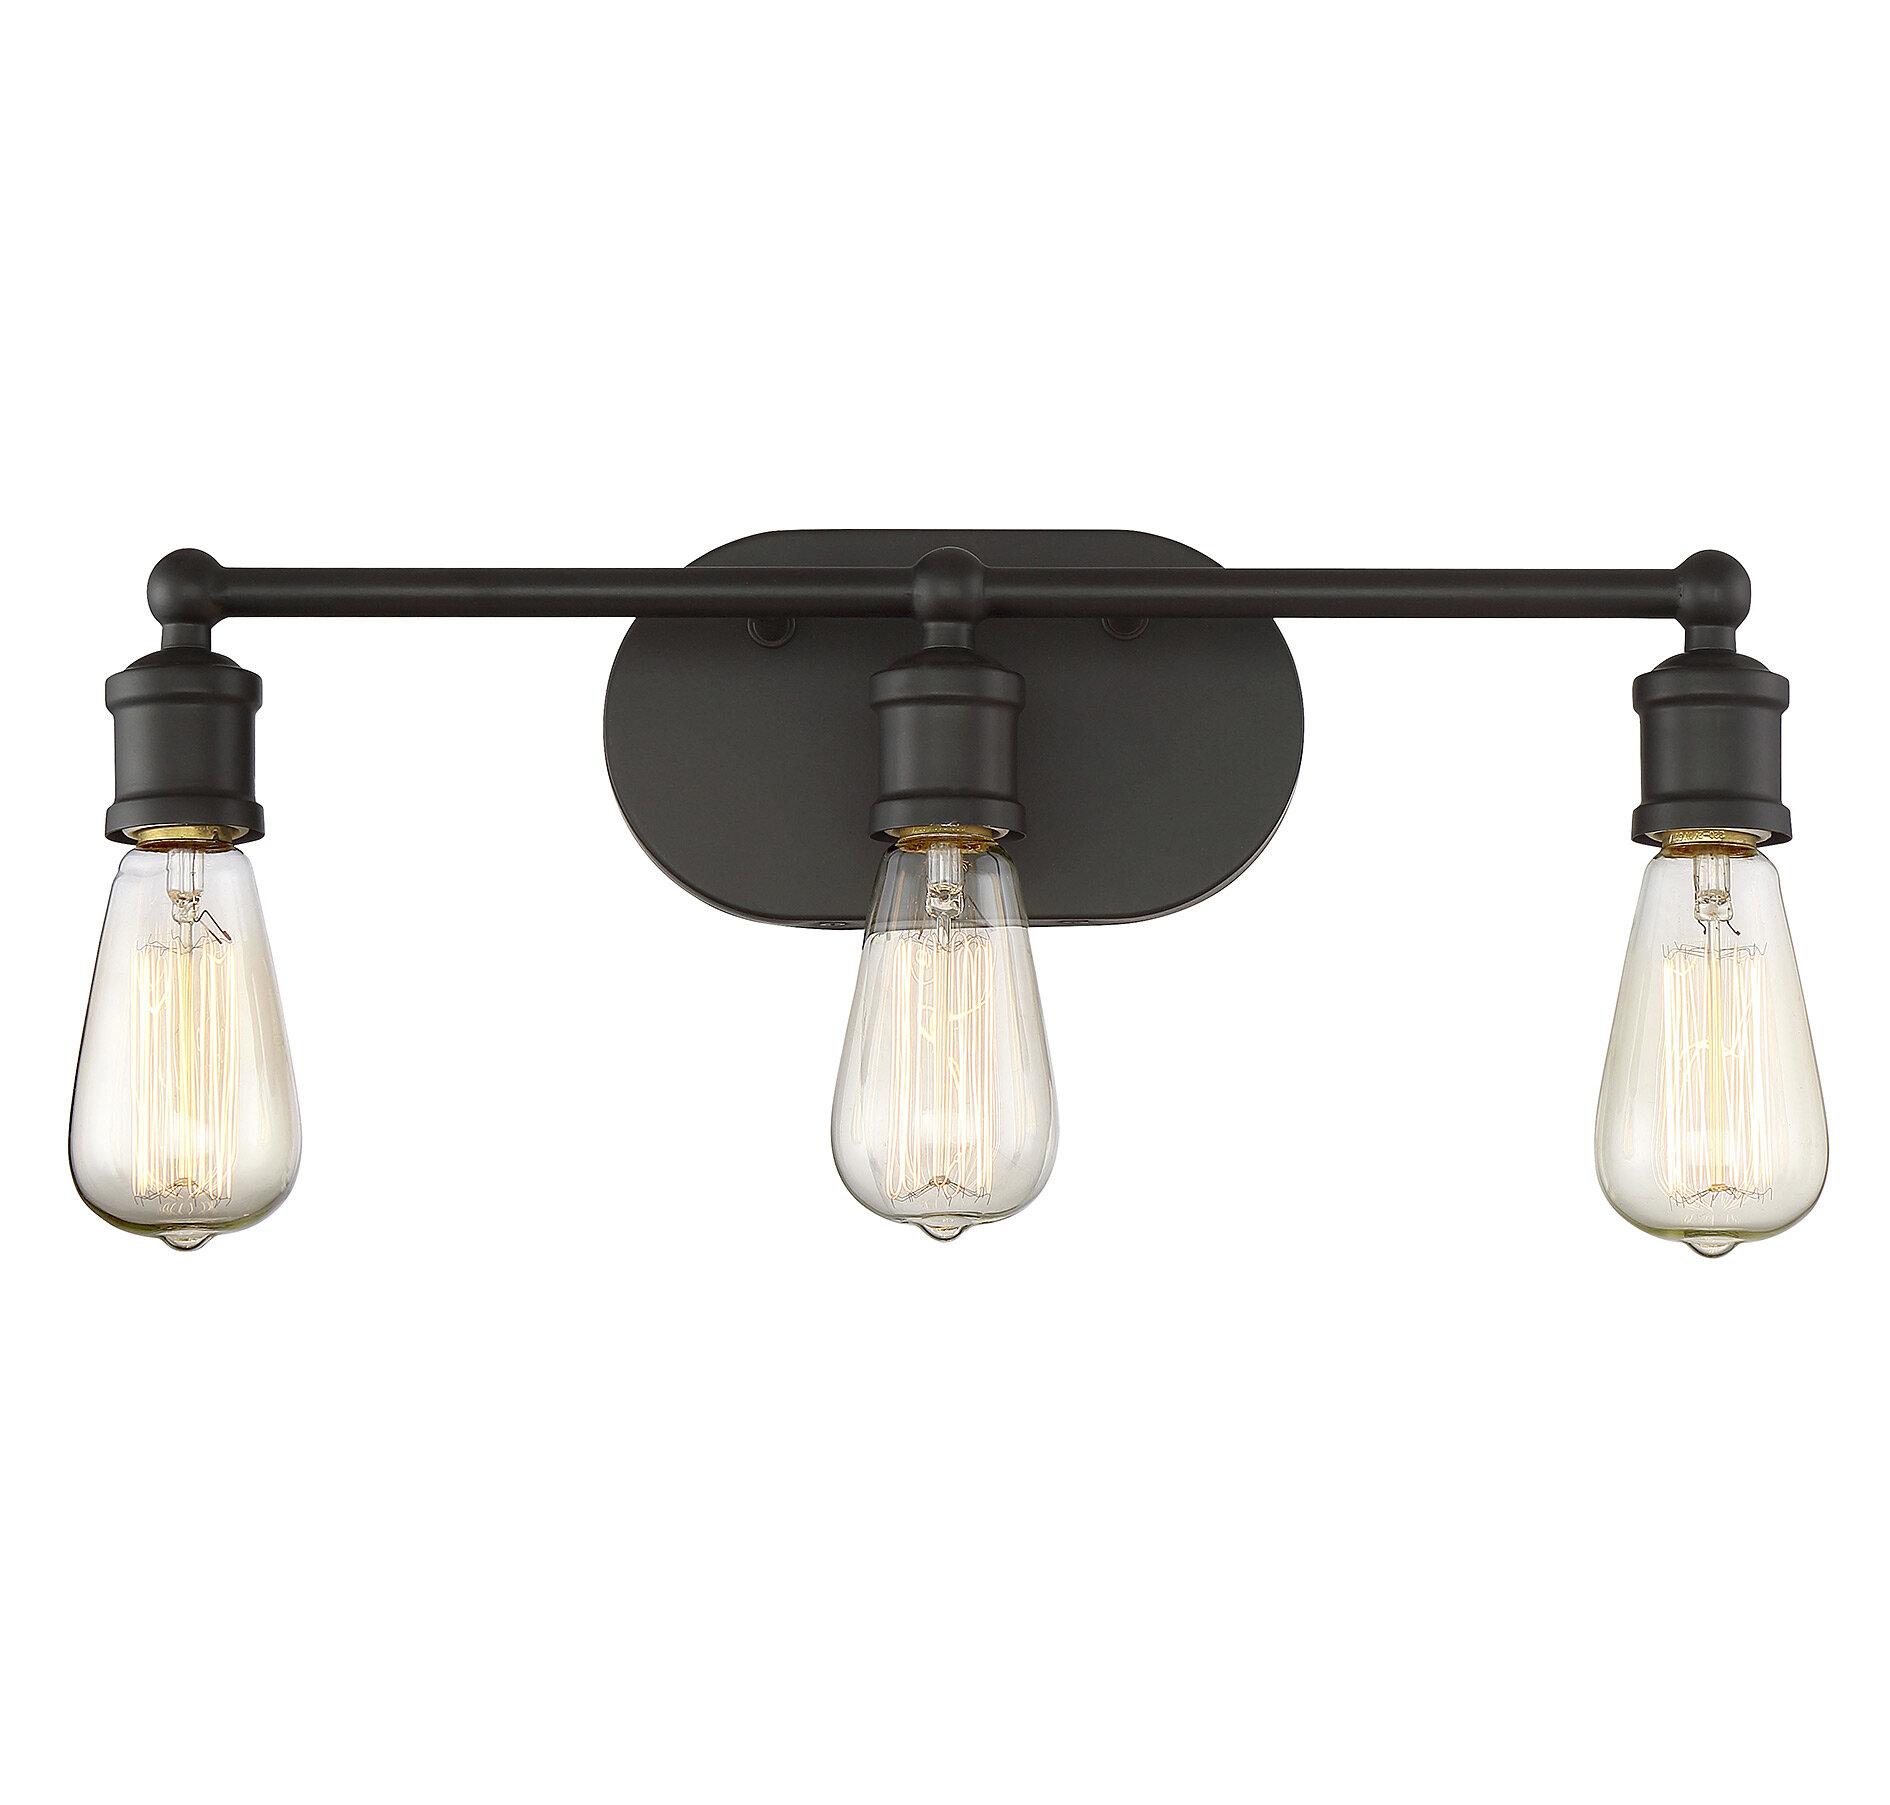 Laurel Foundry Modern Farmhouse Agave 3-Light Vanity Light Fixture ...